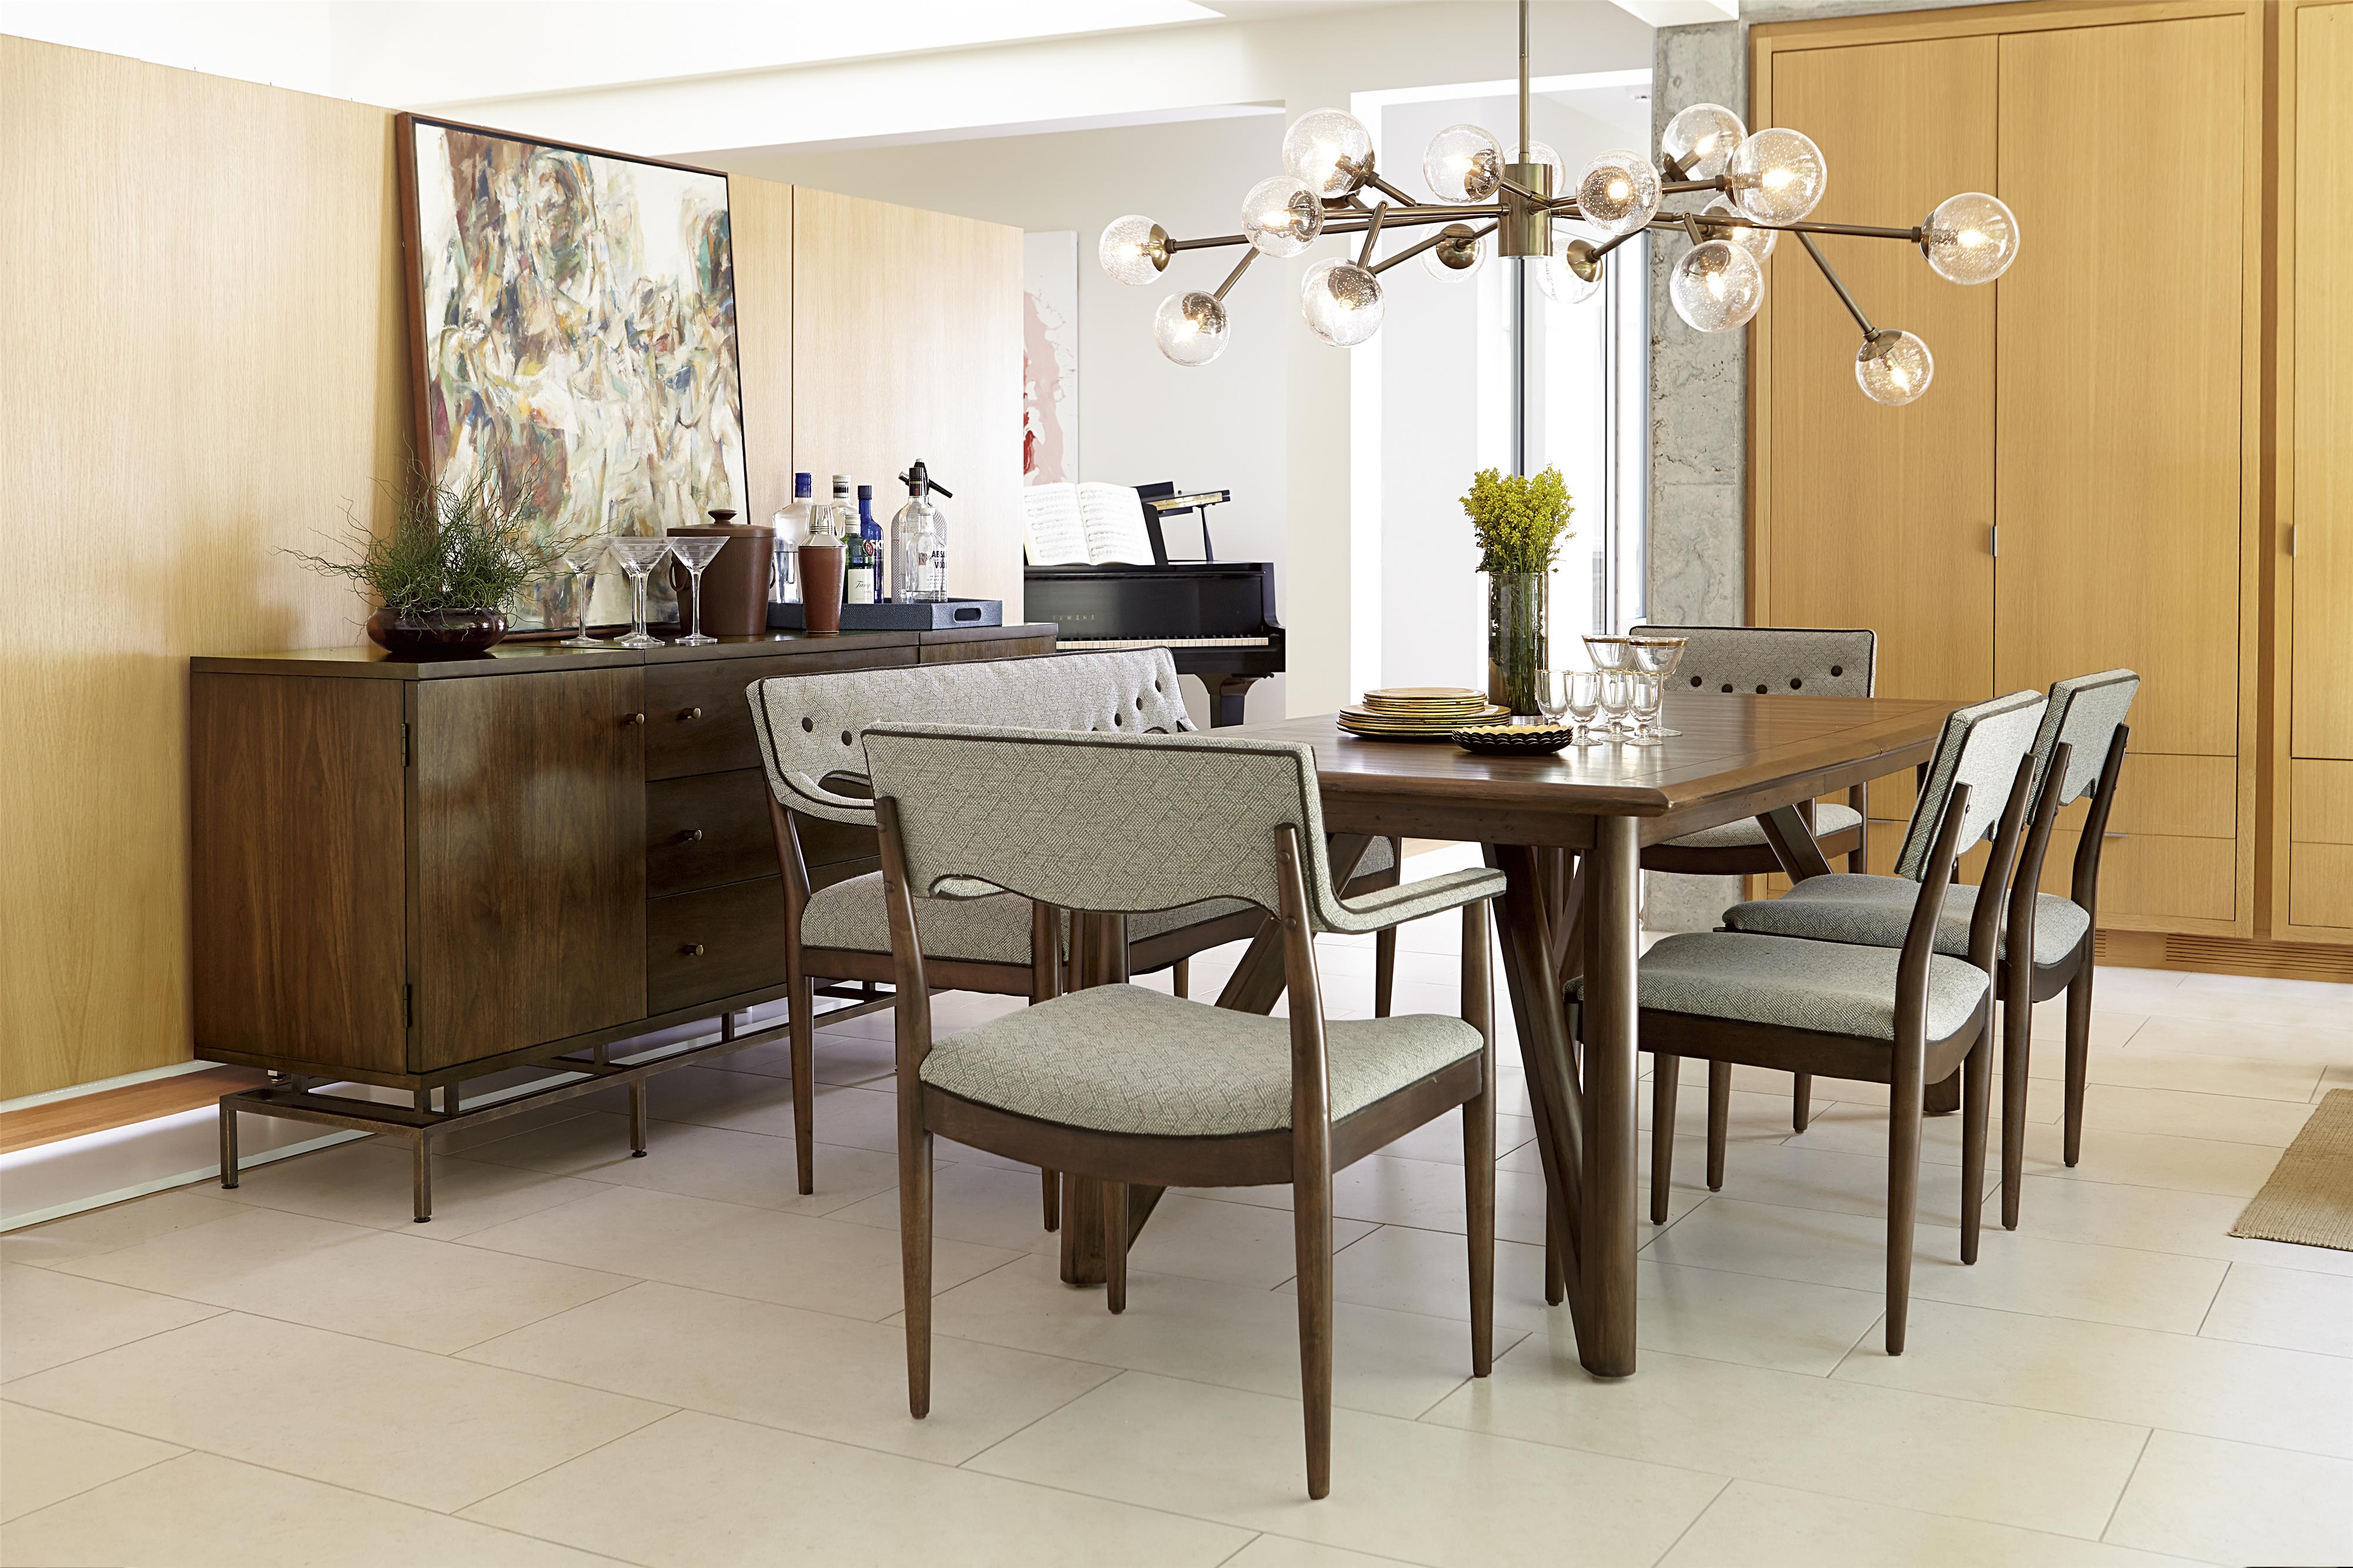 Belfort Signature Urban Treasures Formal Dining Room Group - Item Number: 223000-1812 Dining Room Group 4